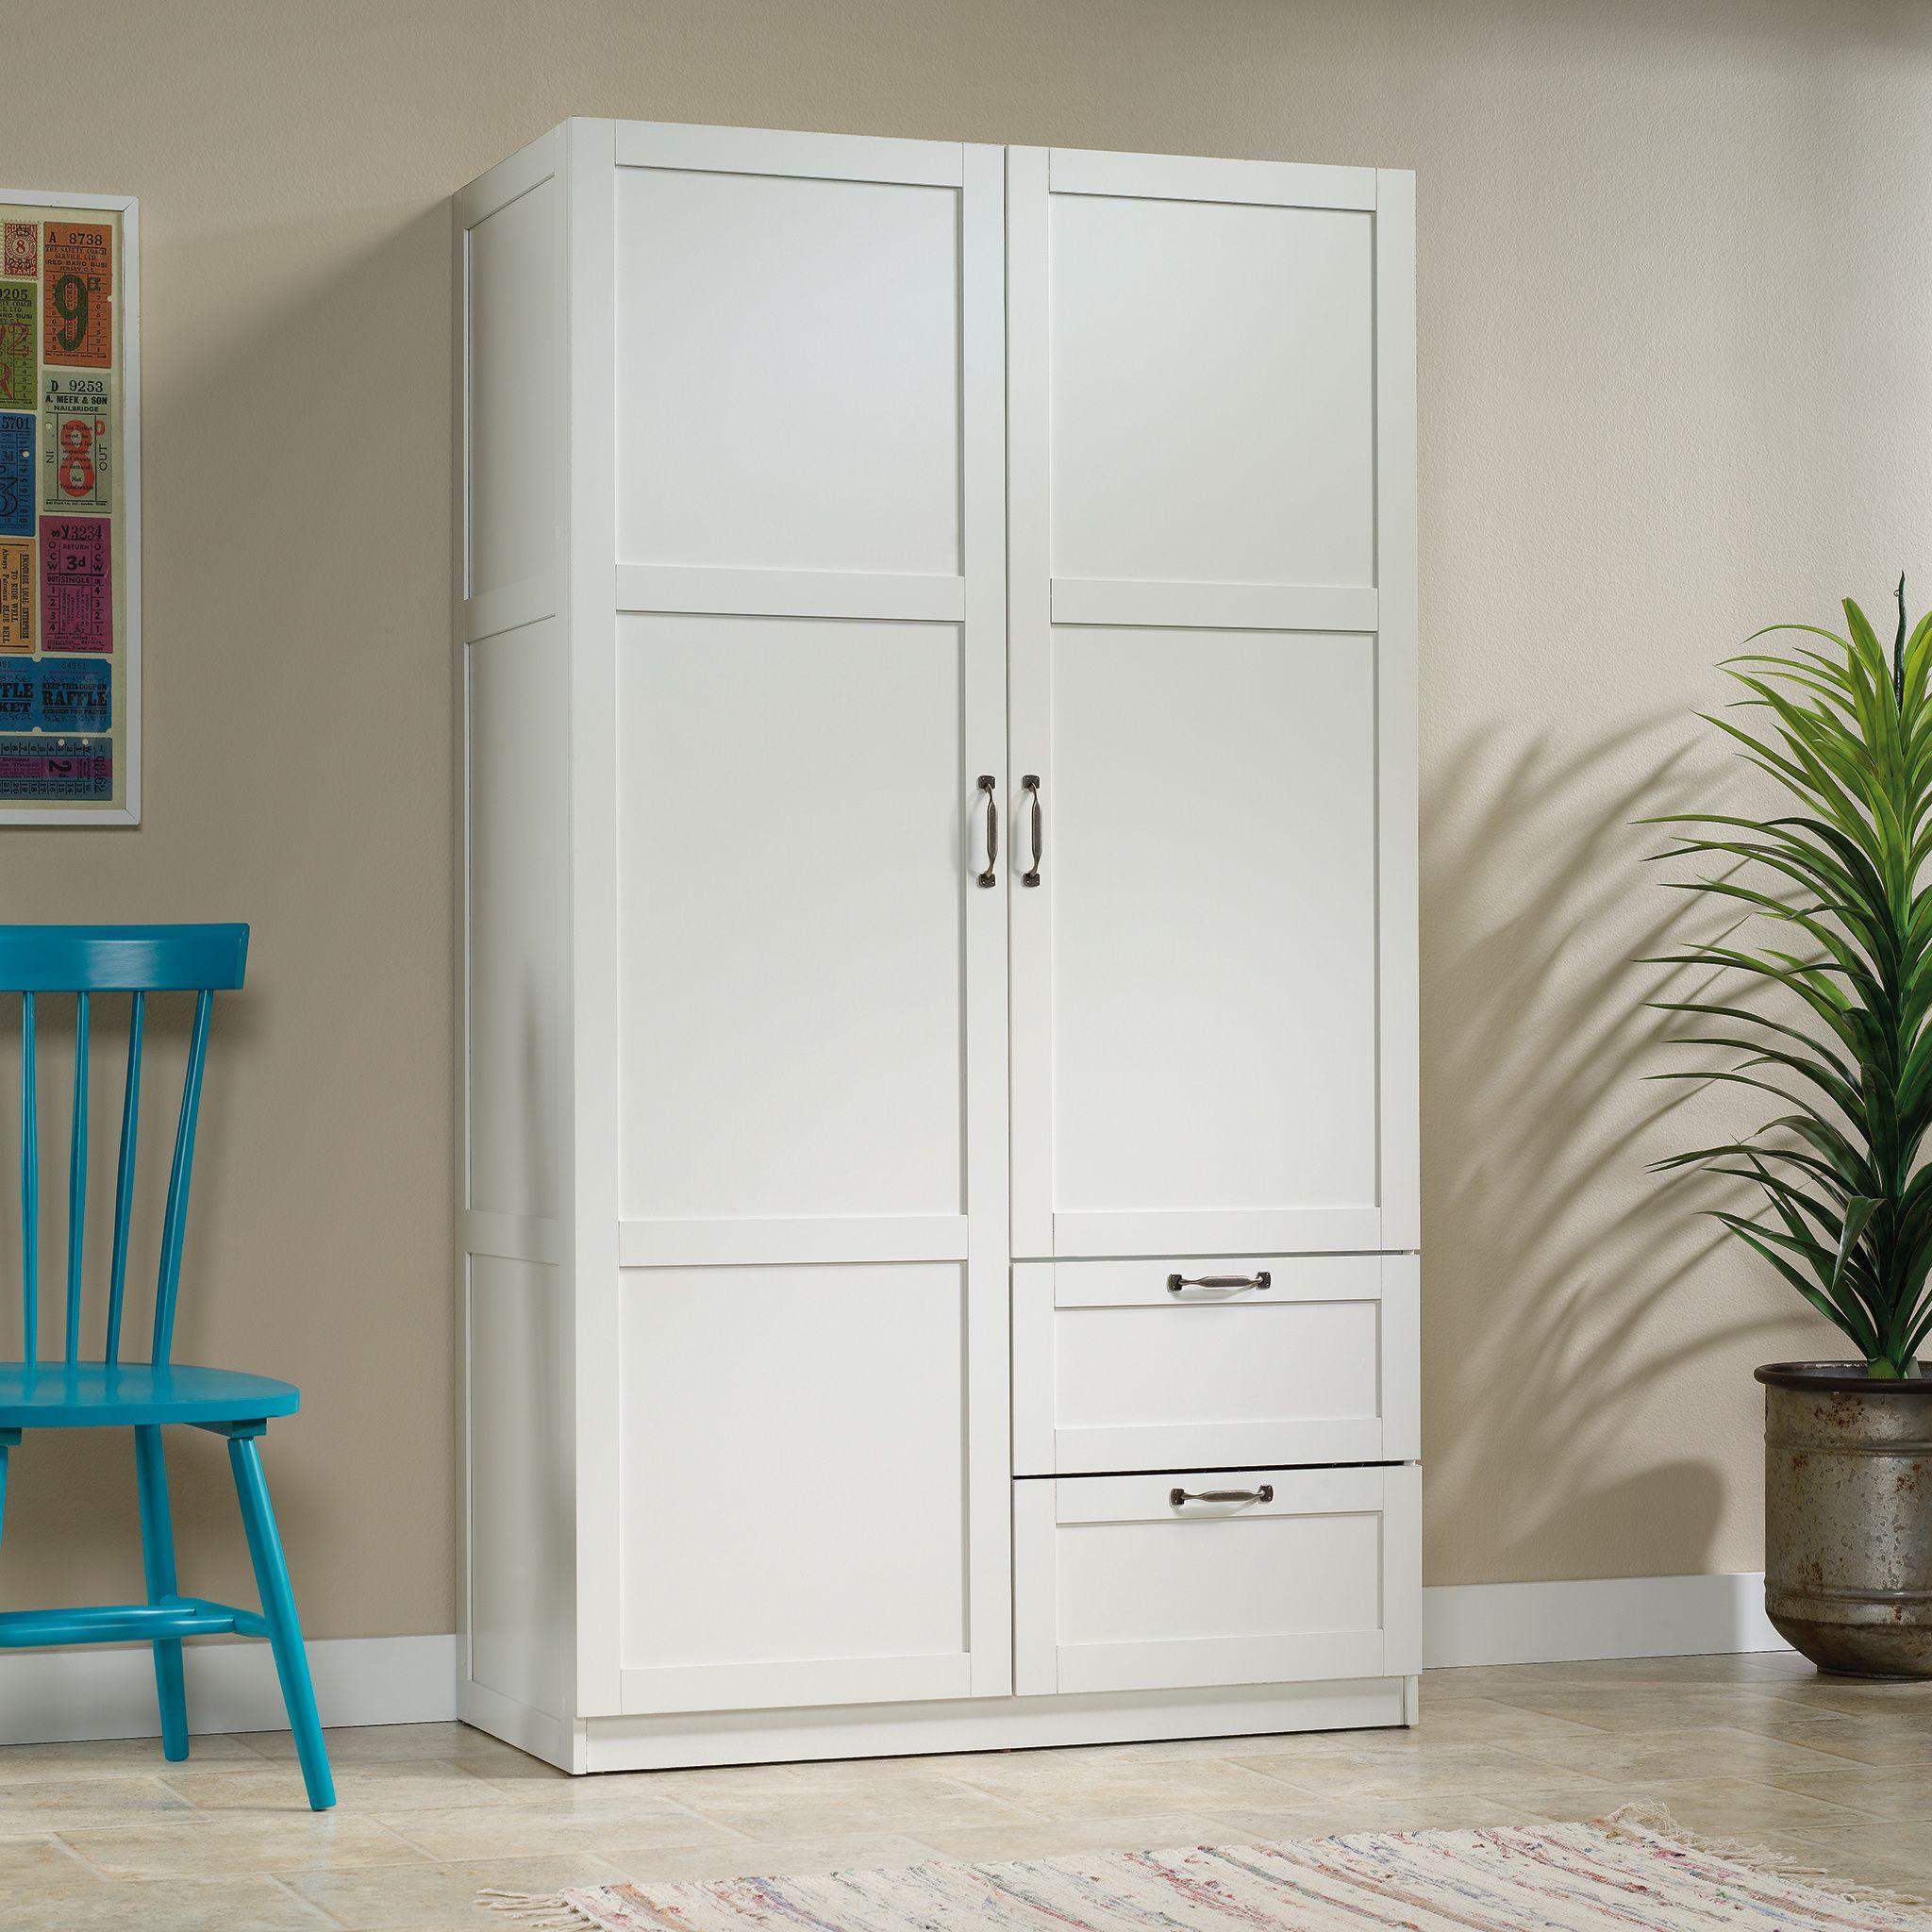 Sauder Select Wardrobe Armoire, White Finish - Walmart.com